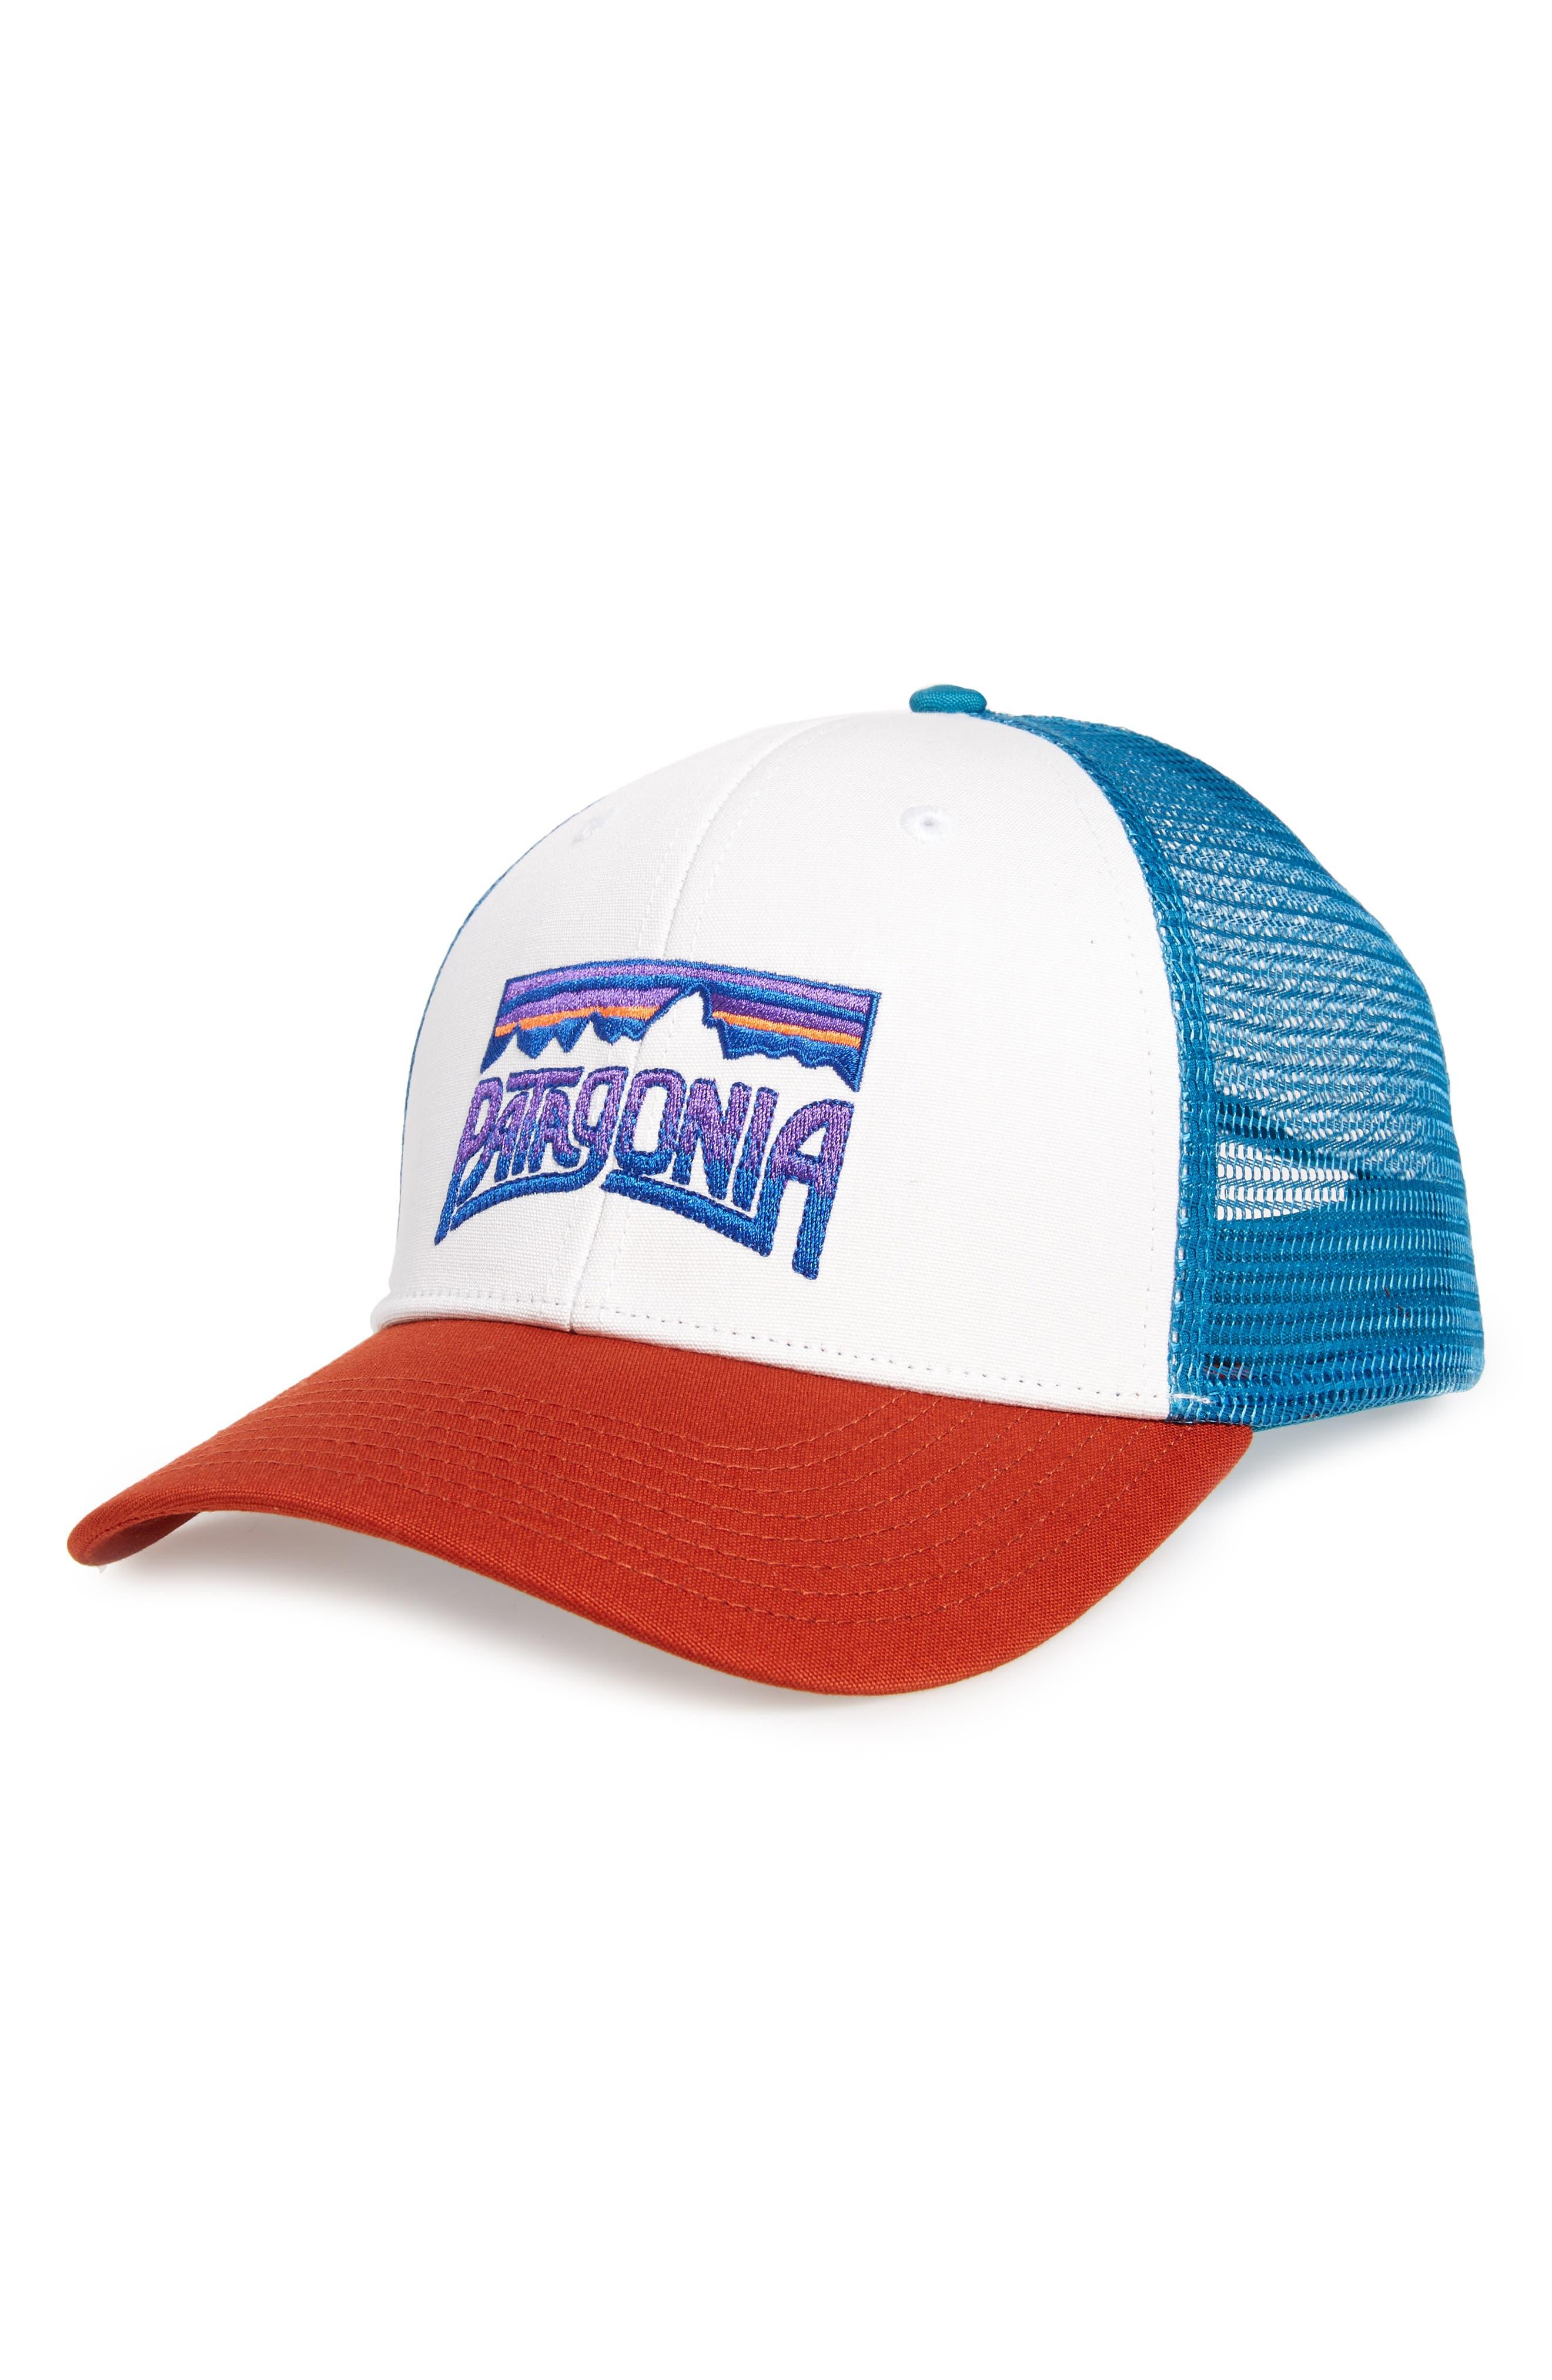 PATAGONIA Fitz Roy Frostbite Trucker Cap